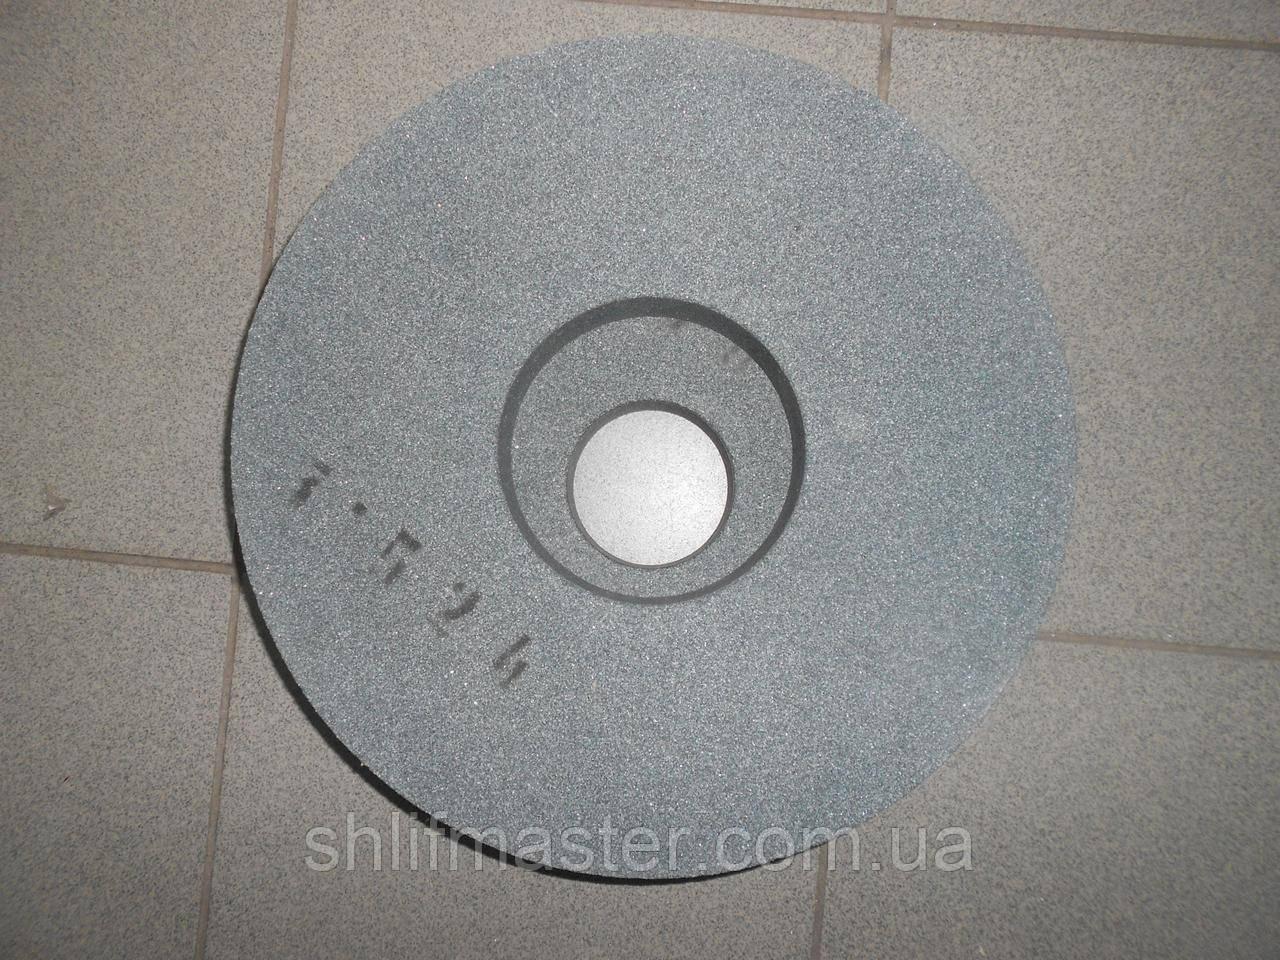 Абразивный круг шлифовальный (электрокорунд белый) 25А ПП 300х13х127 25-40 М2-СТ